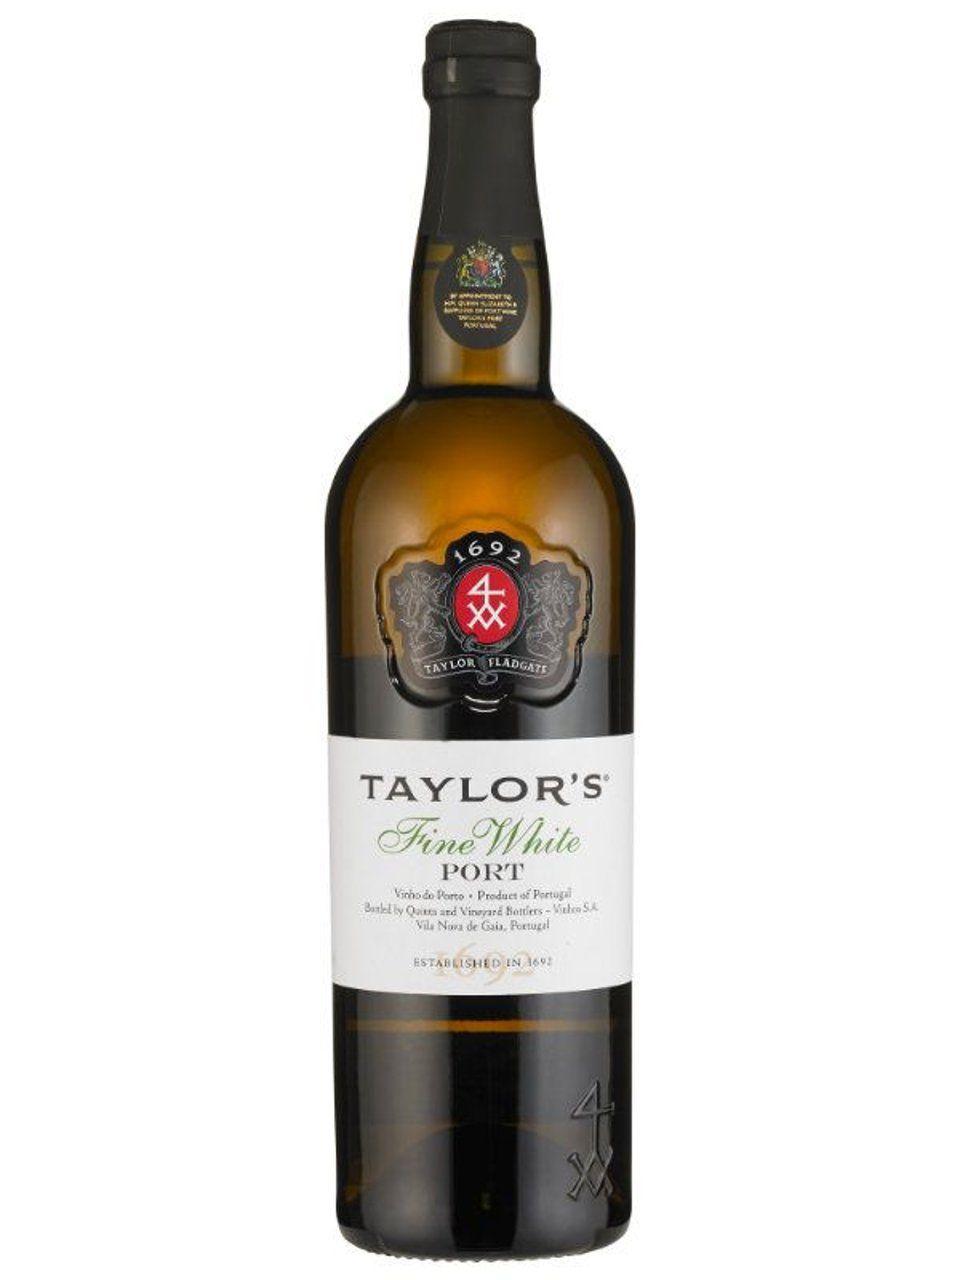 Taylors Fine White Port